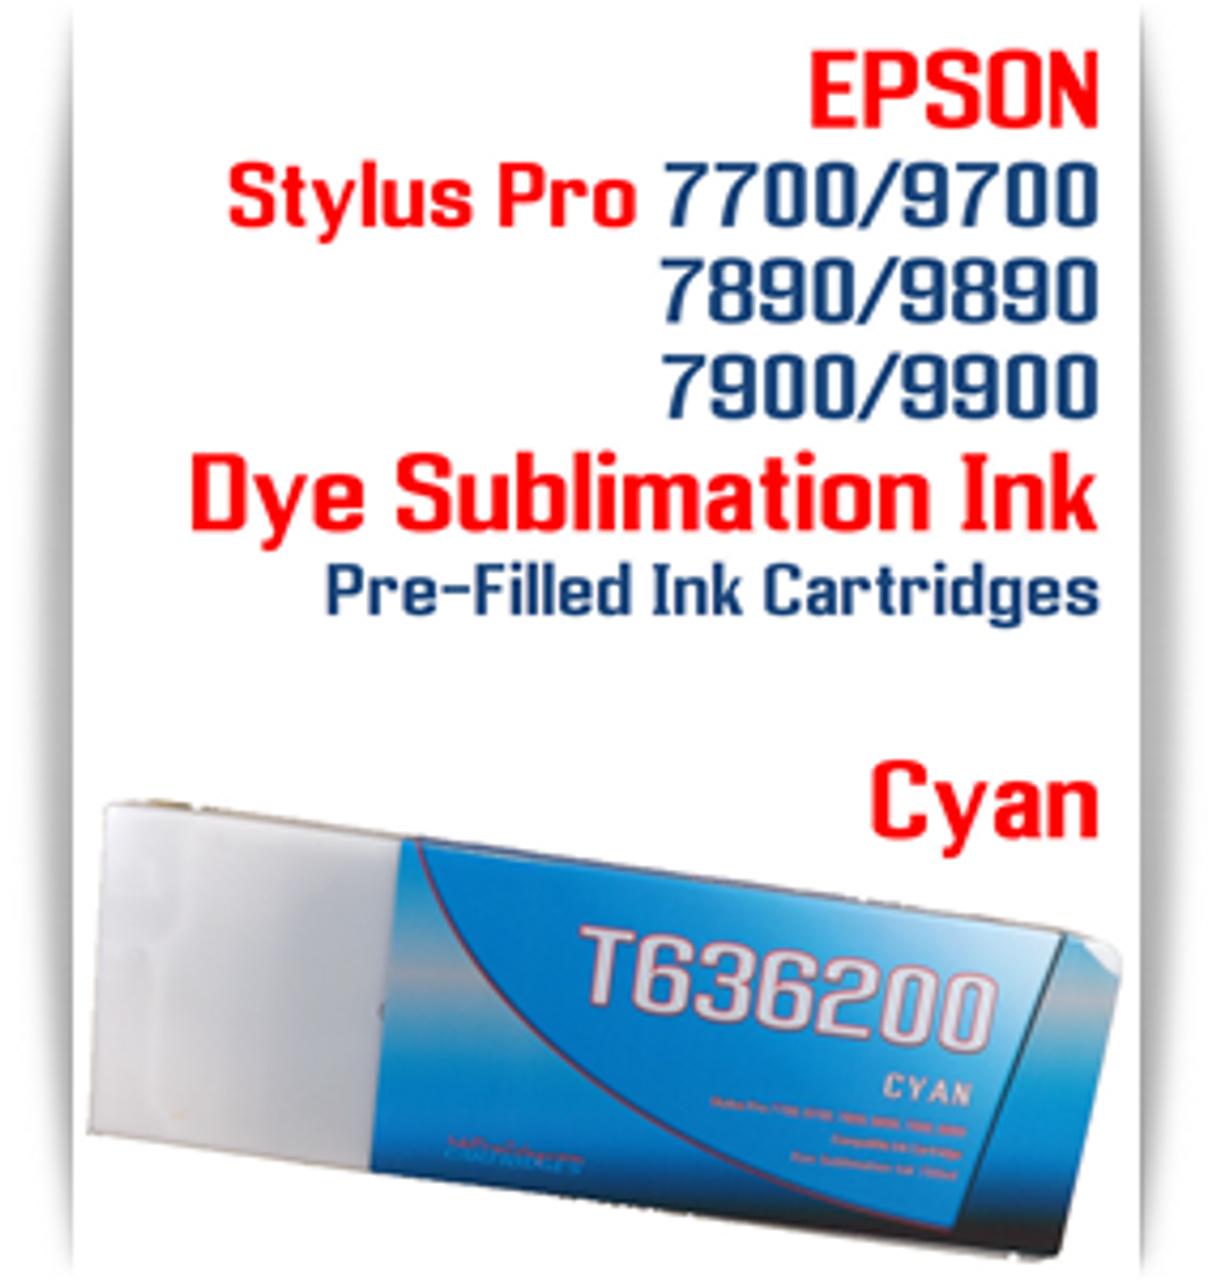 Cyan Epson Stylus Pro 7890/9890 Pre-Filled Dye Sublimation Ink Cartridge